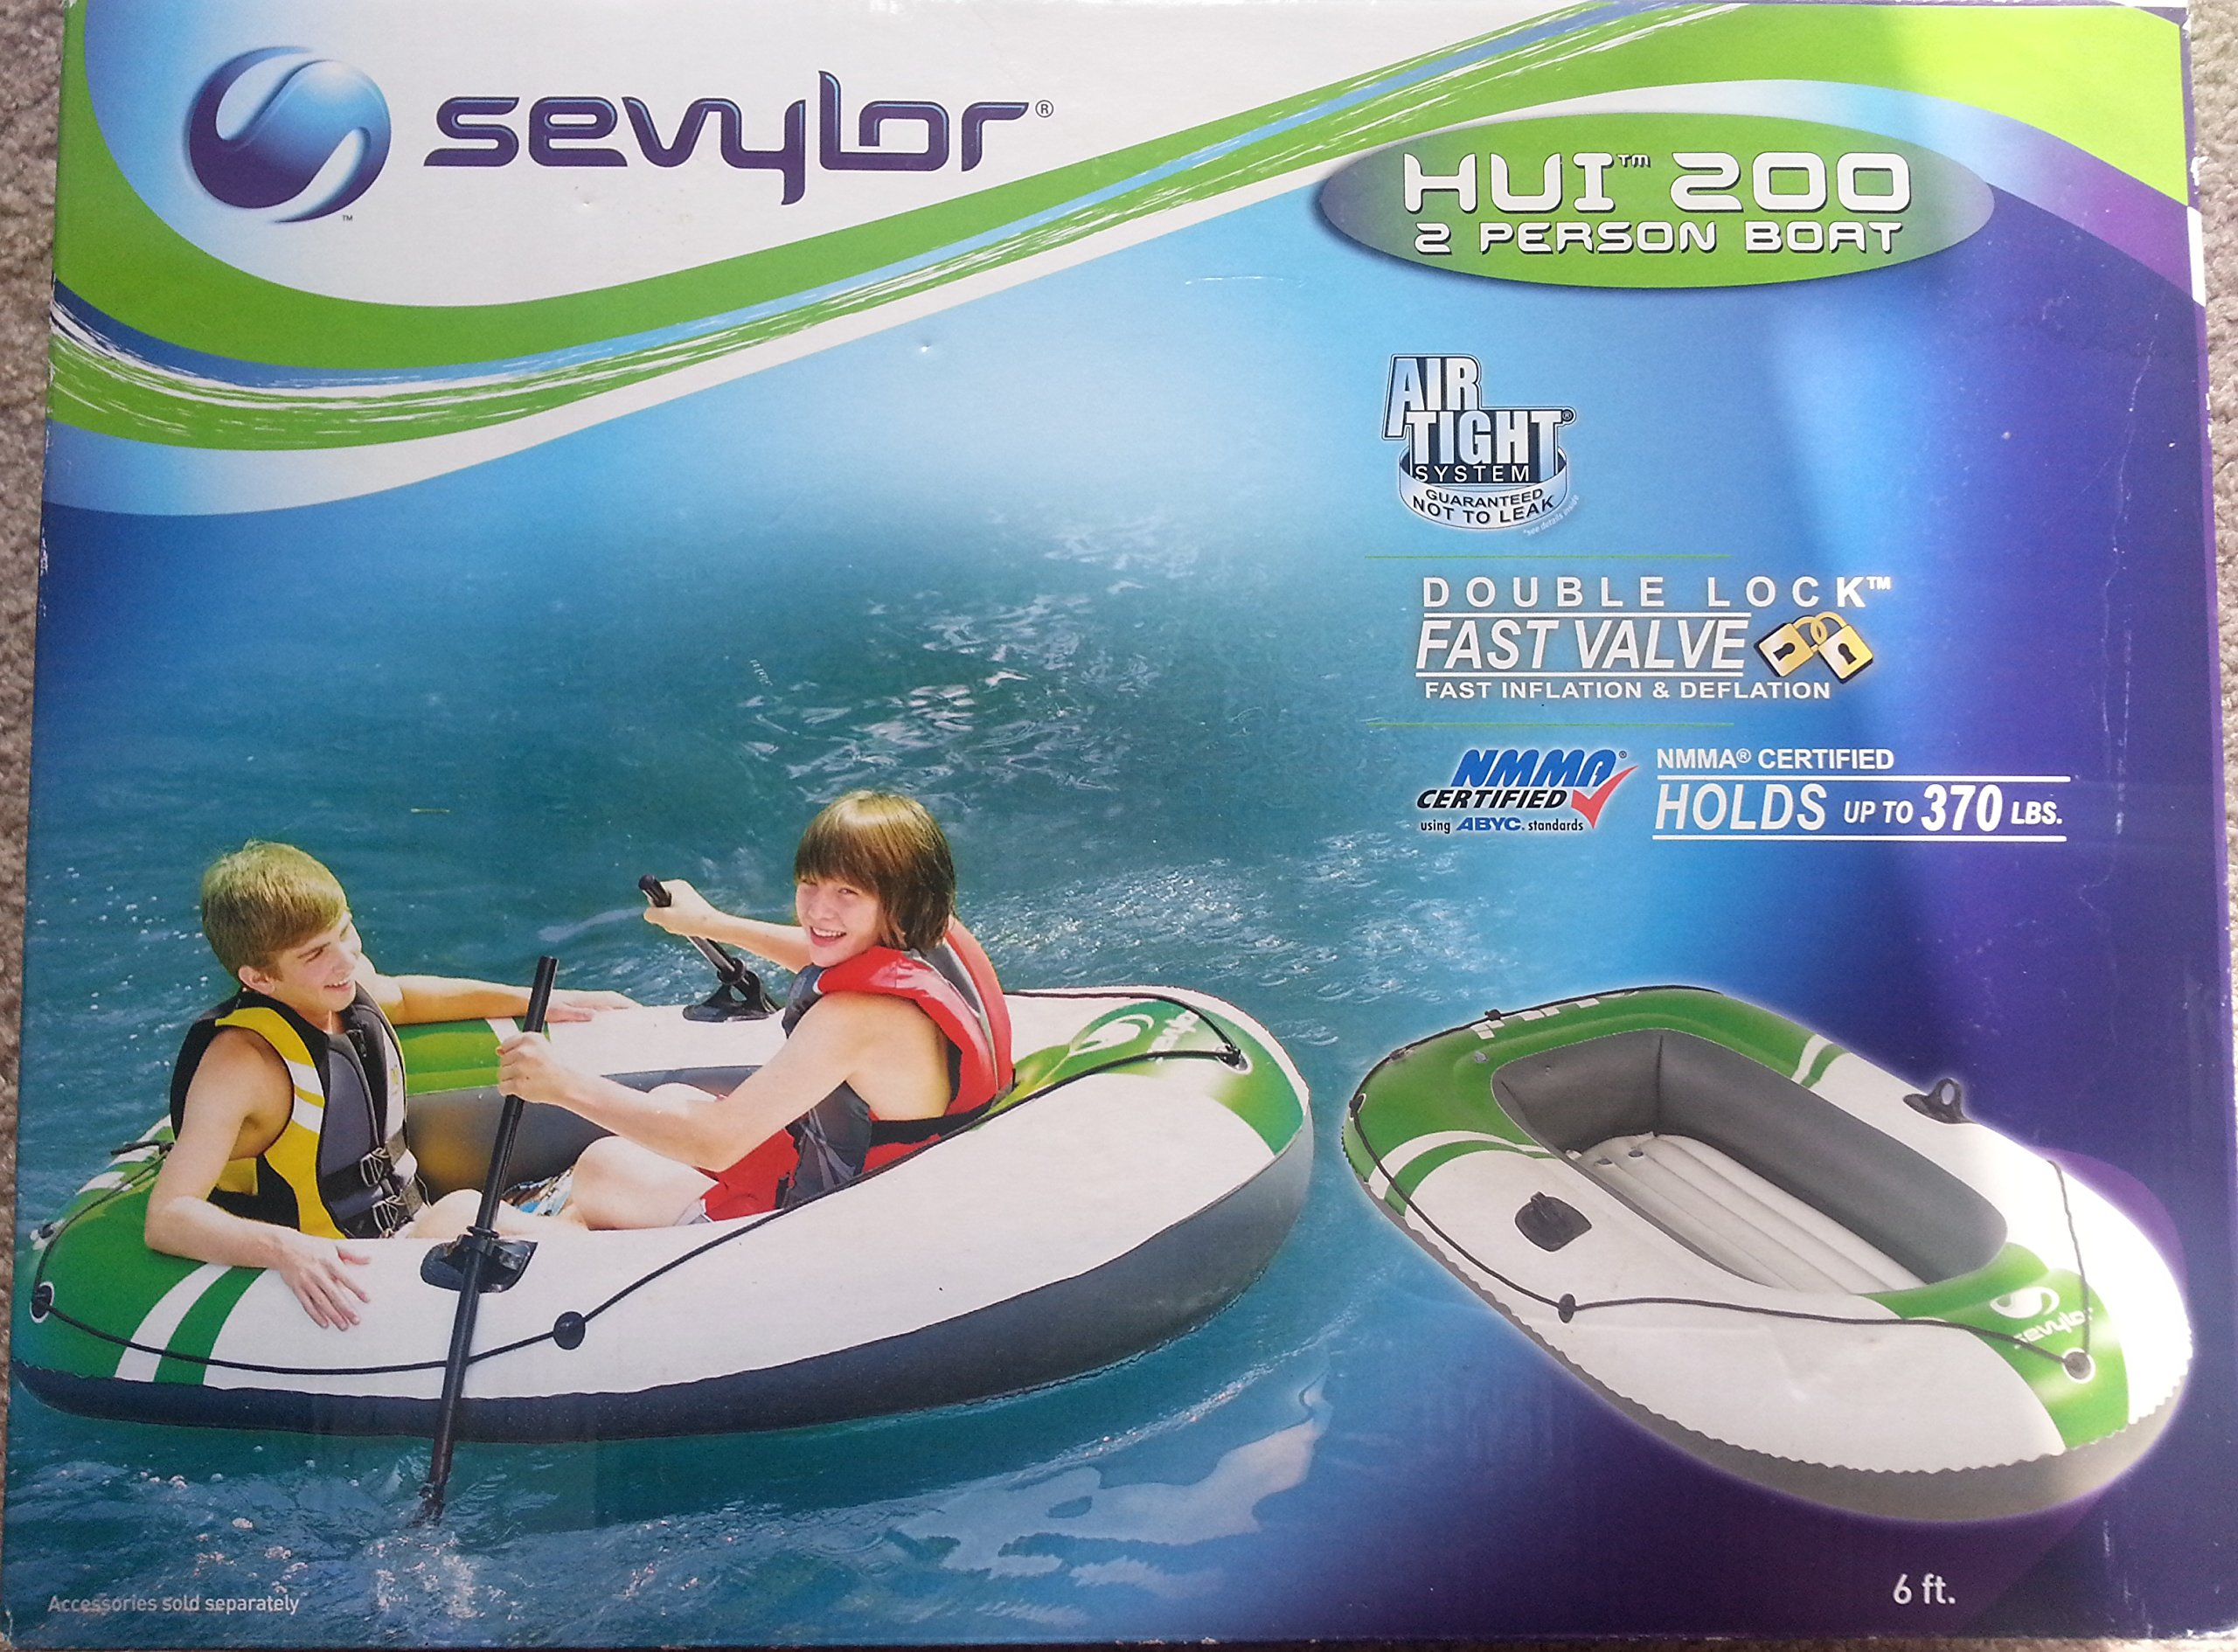 Sevylor 2 Person Boat HUI 200